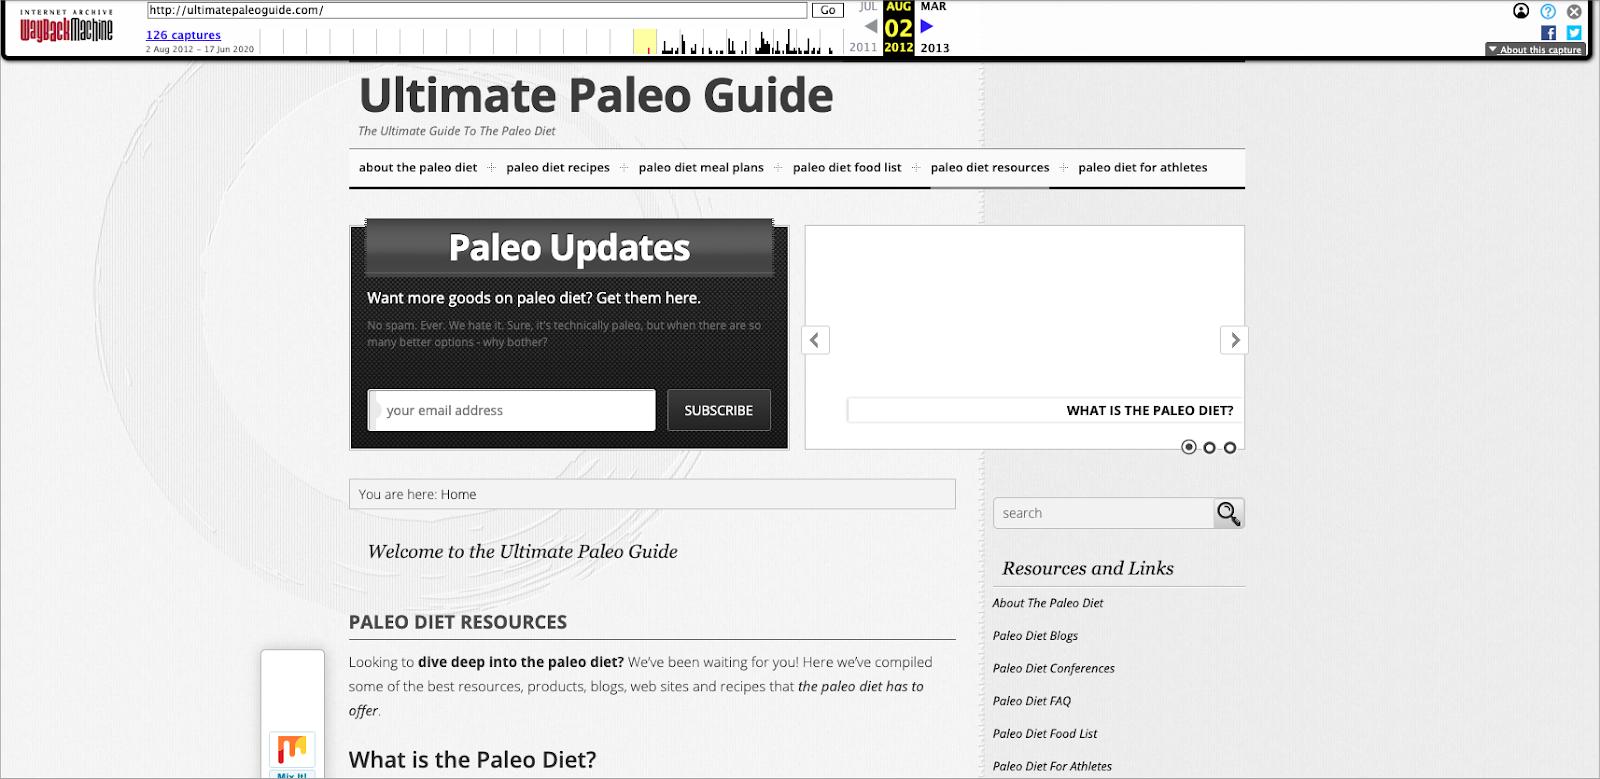 Ultimate paleo guide